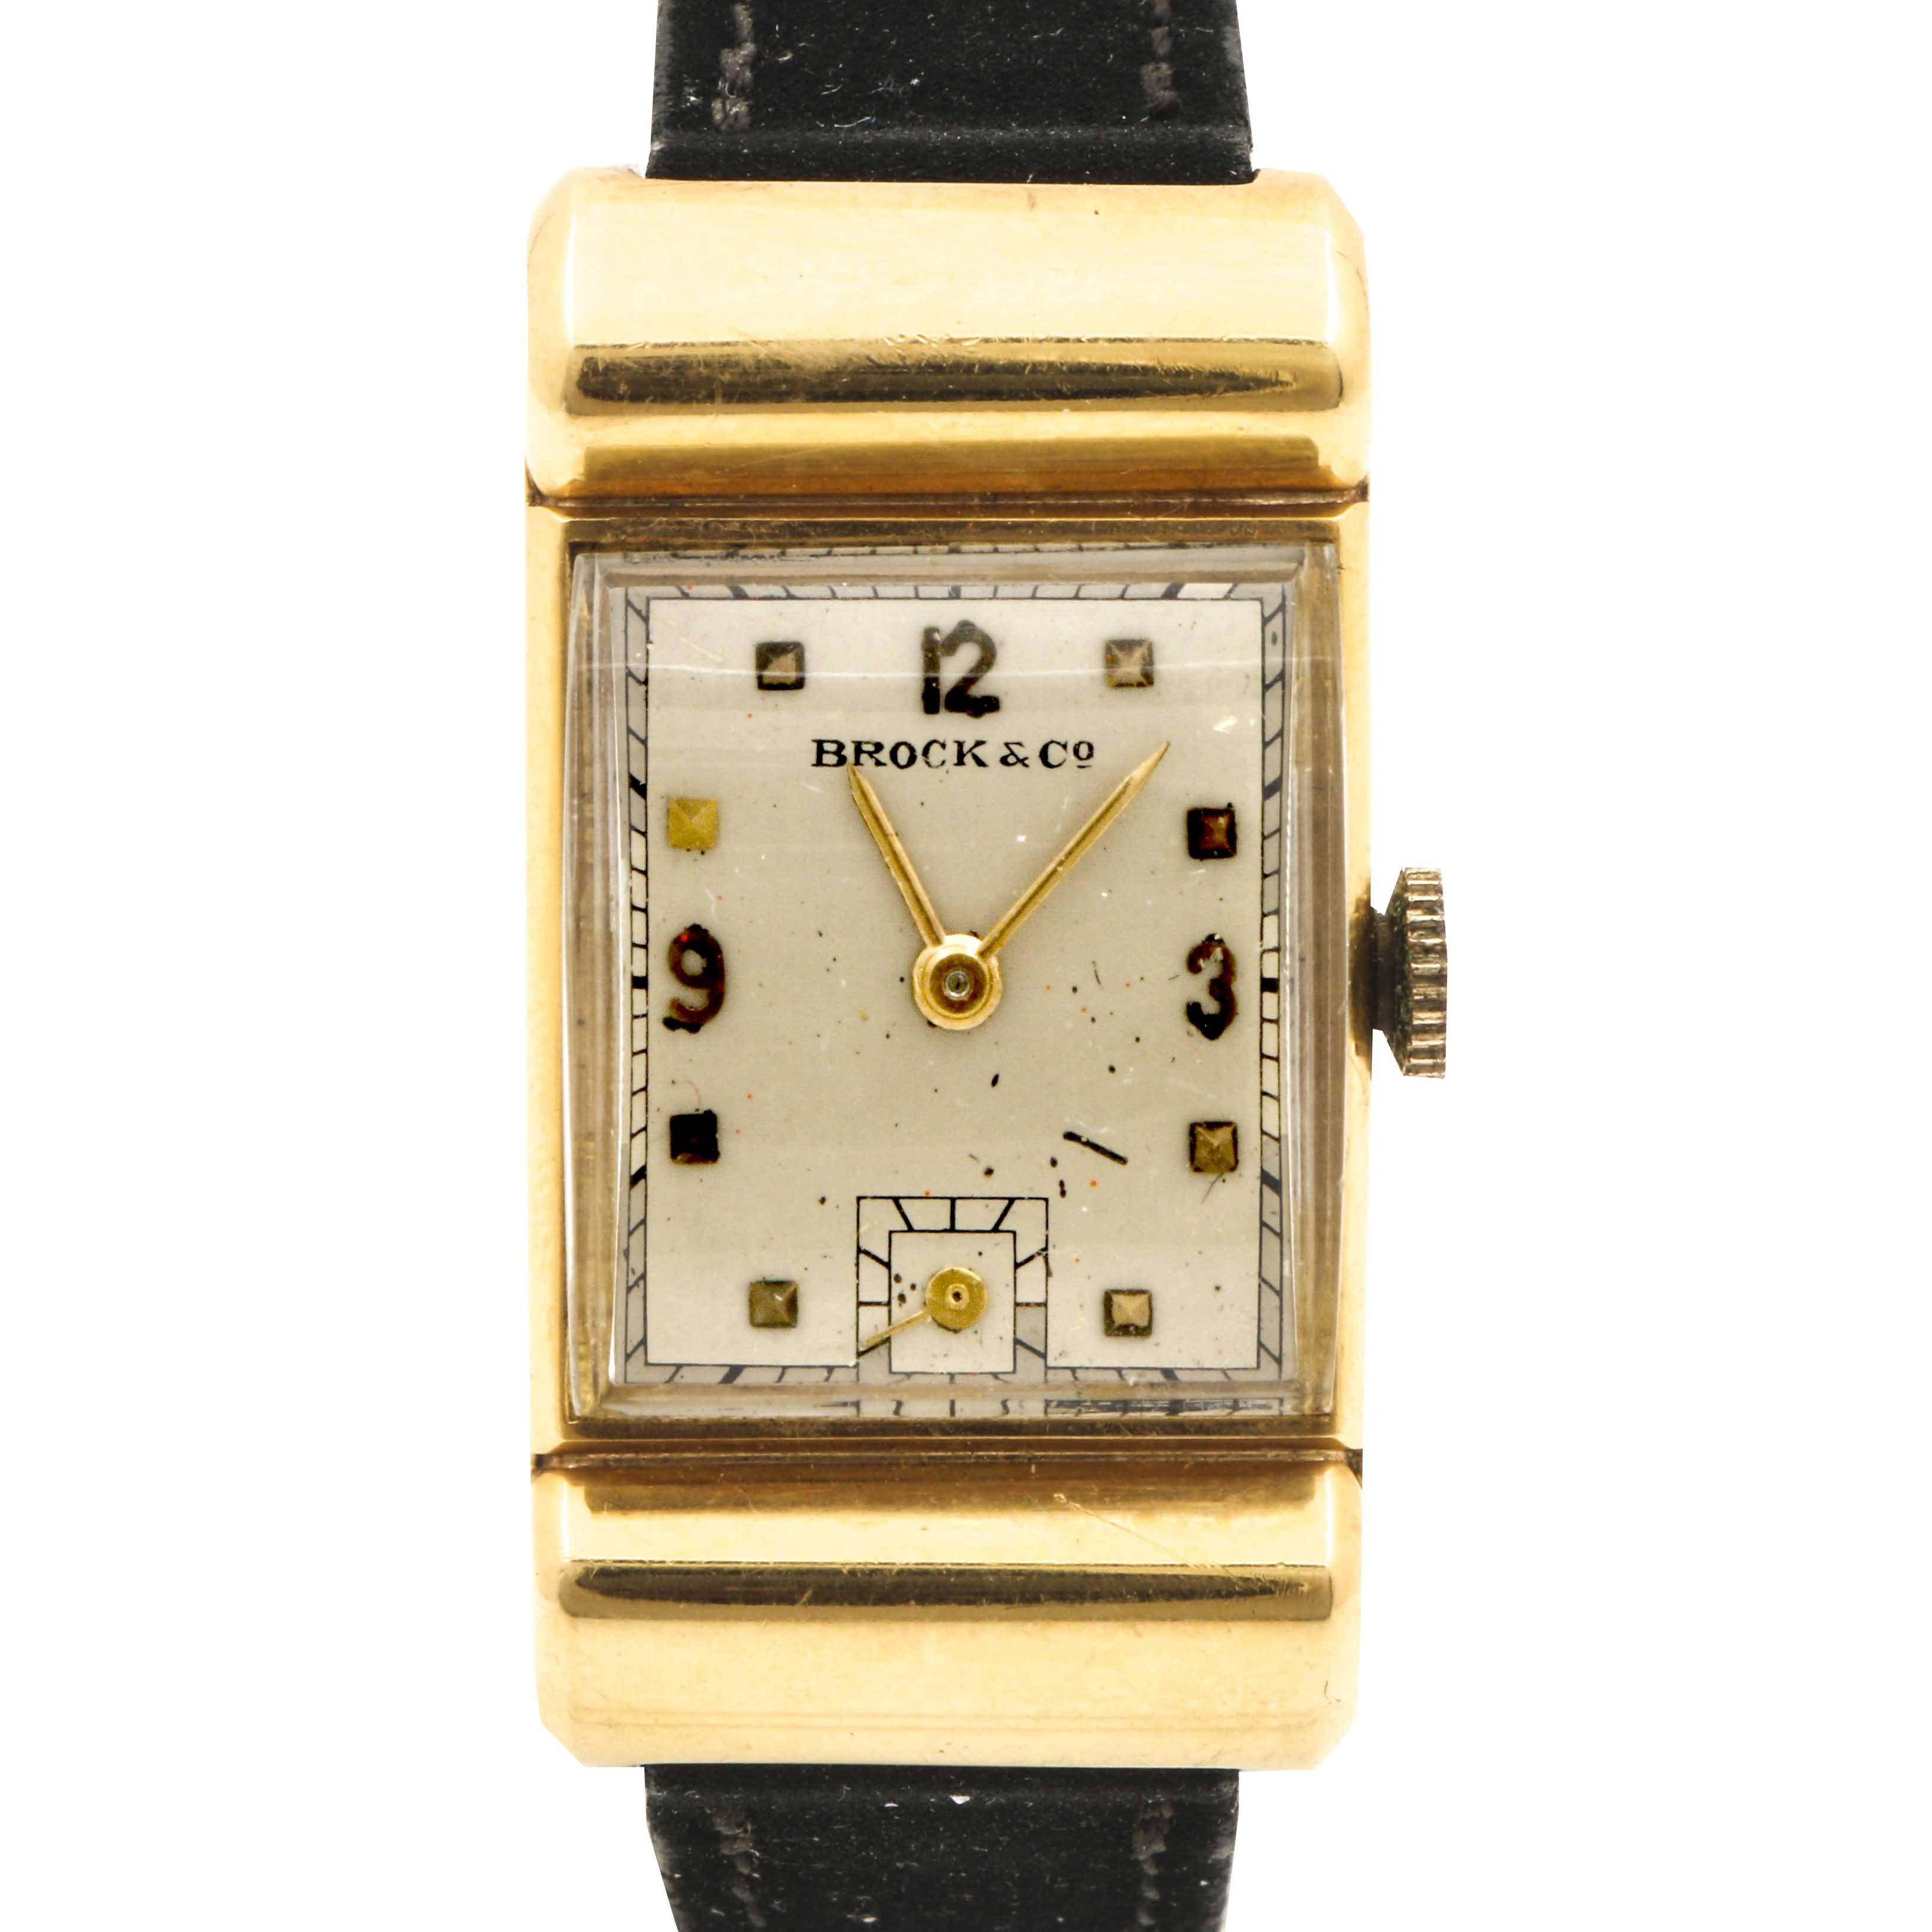 Brock & Co. 18K Yellow Gold Wristwatch